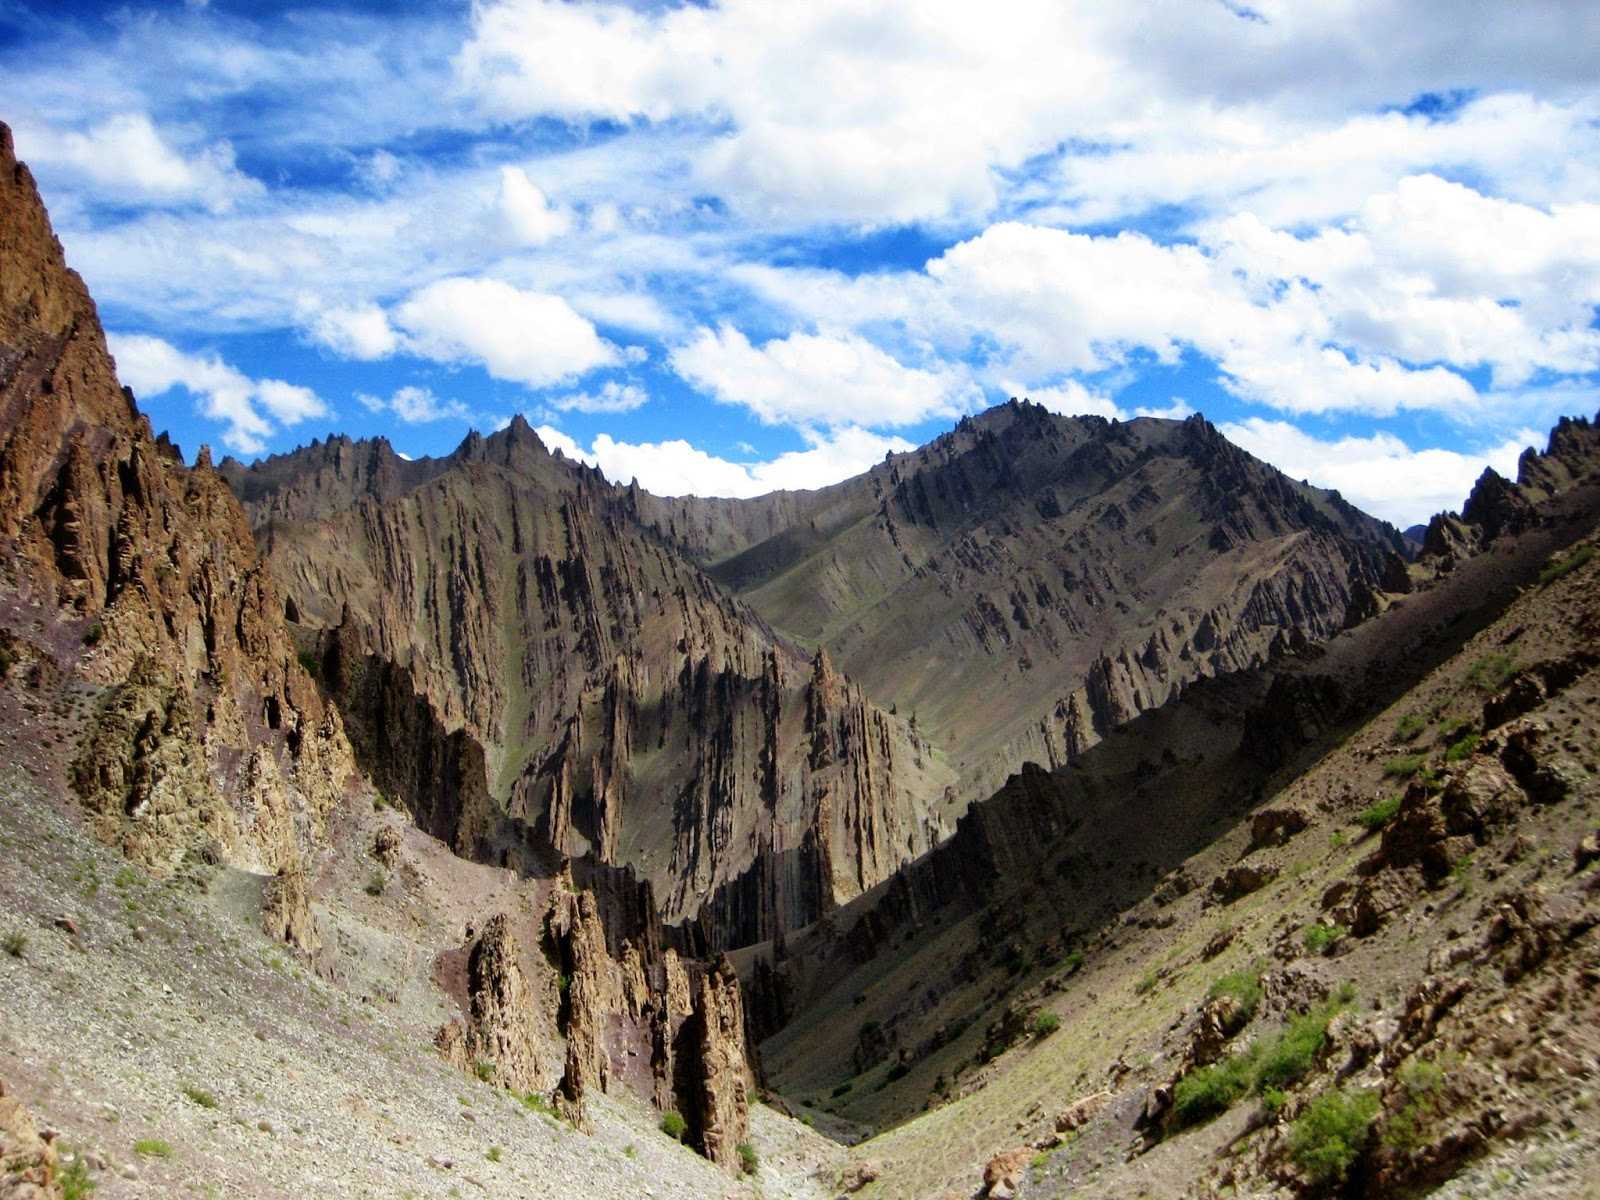 Stok Range, Ladakh